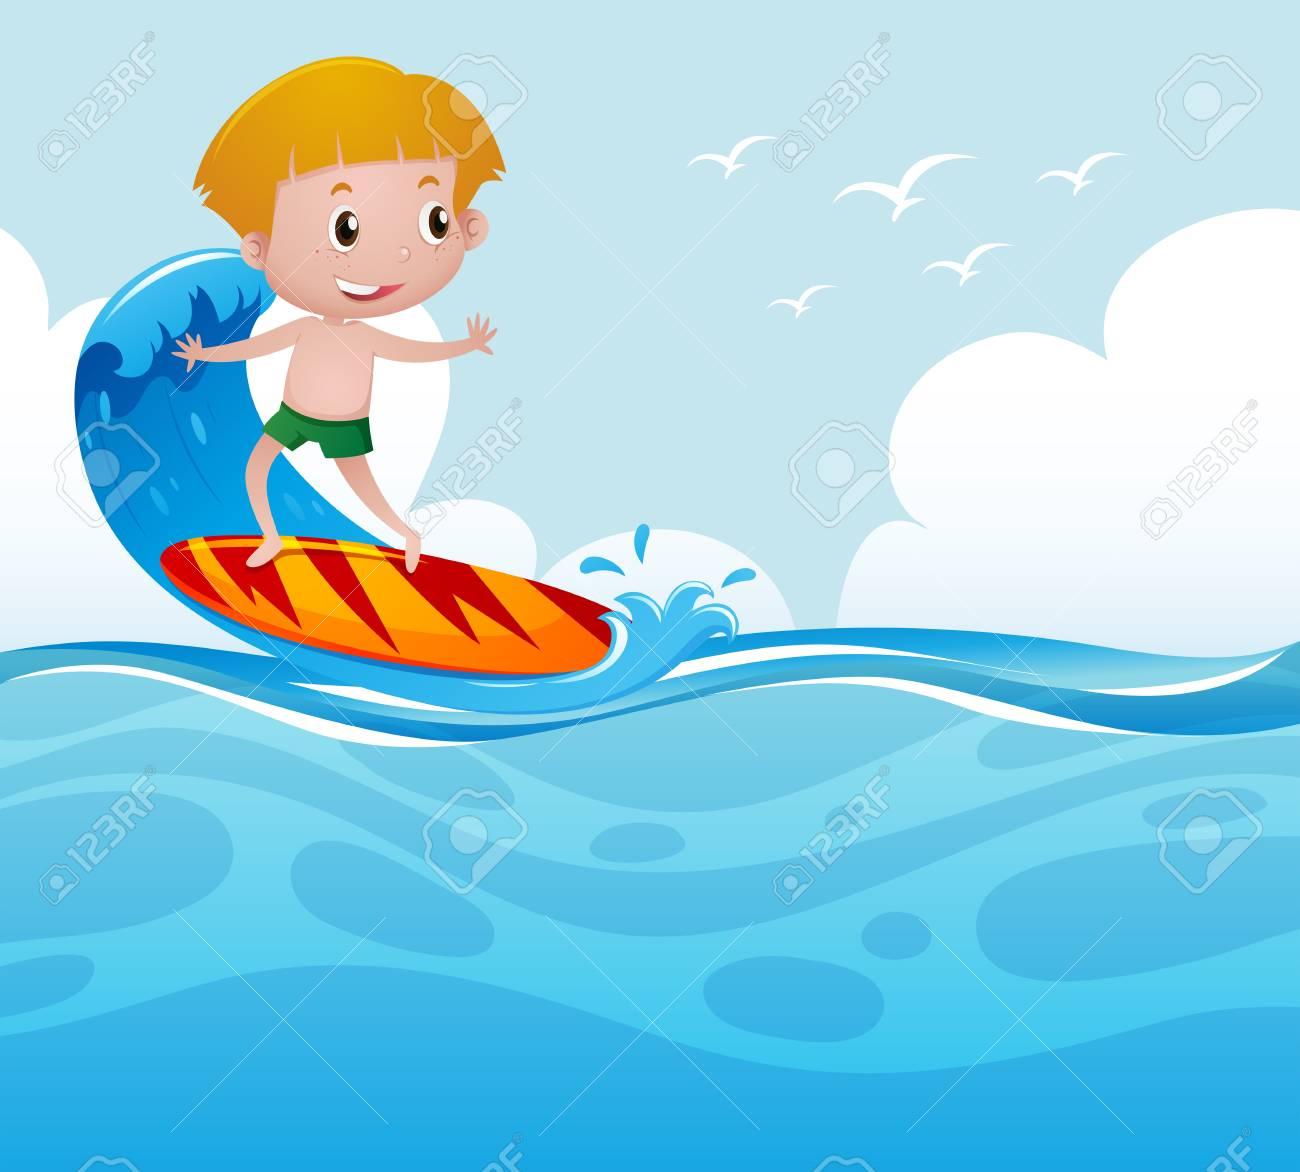 Boy surfing on the wave illustration.